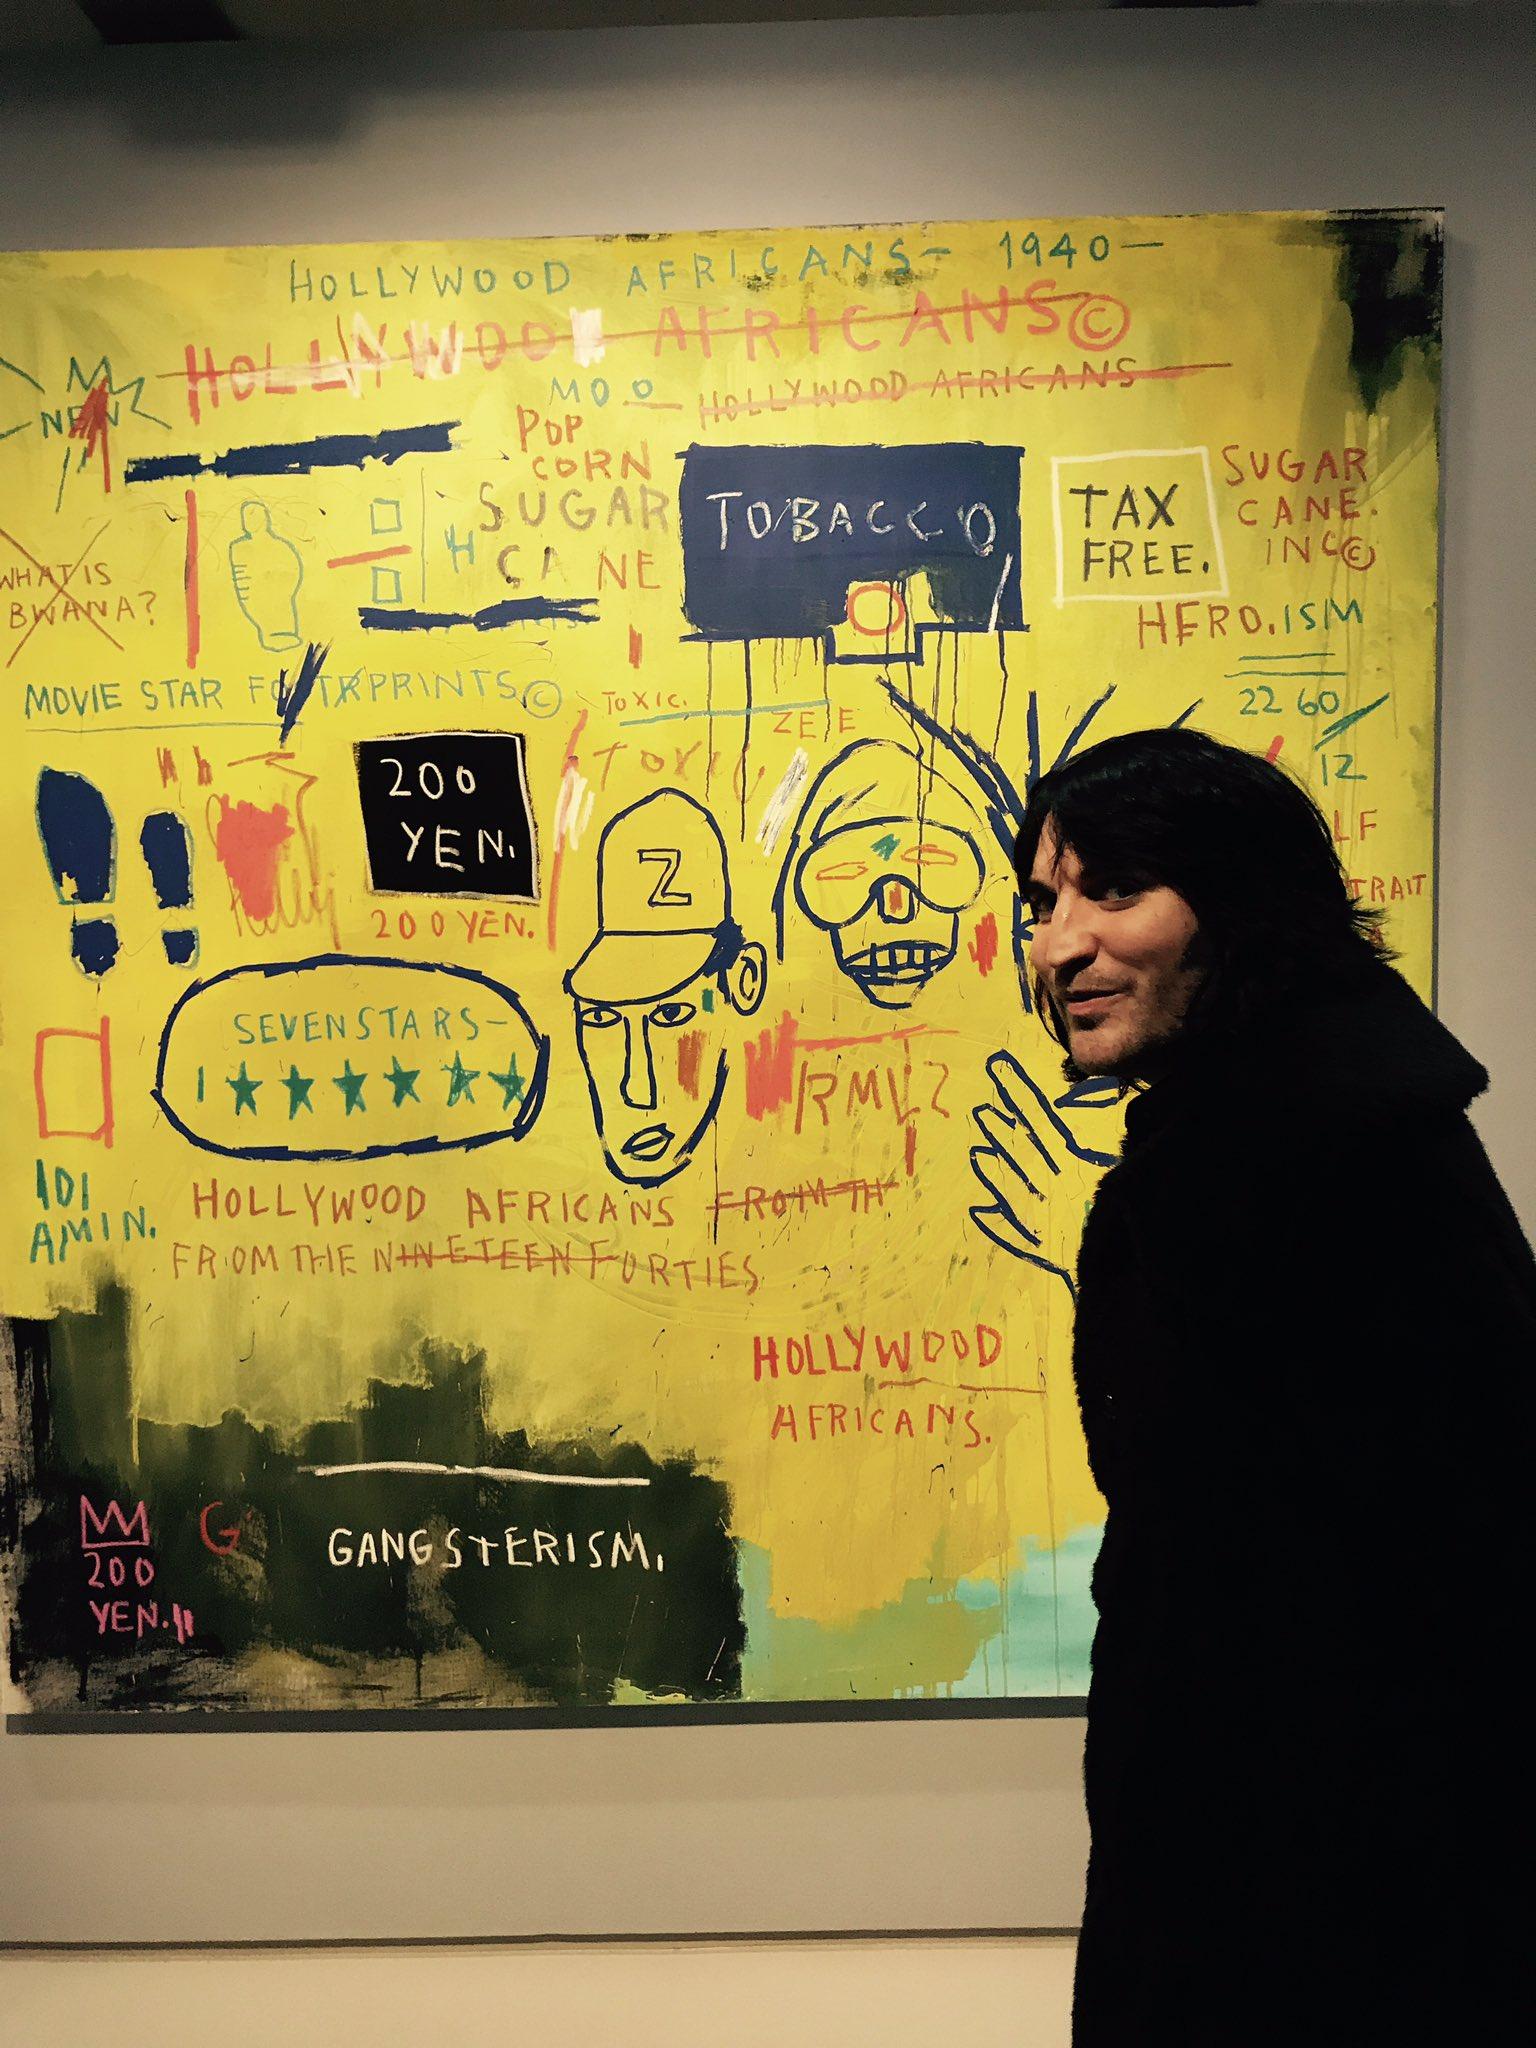 Jean Michael Basquiat the genius child ! Go check him out at the Barbican x https://t.co/7H0dsyaFCj